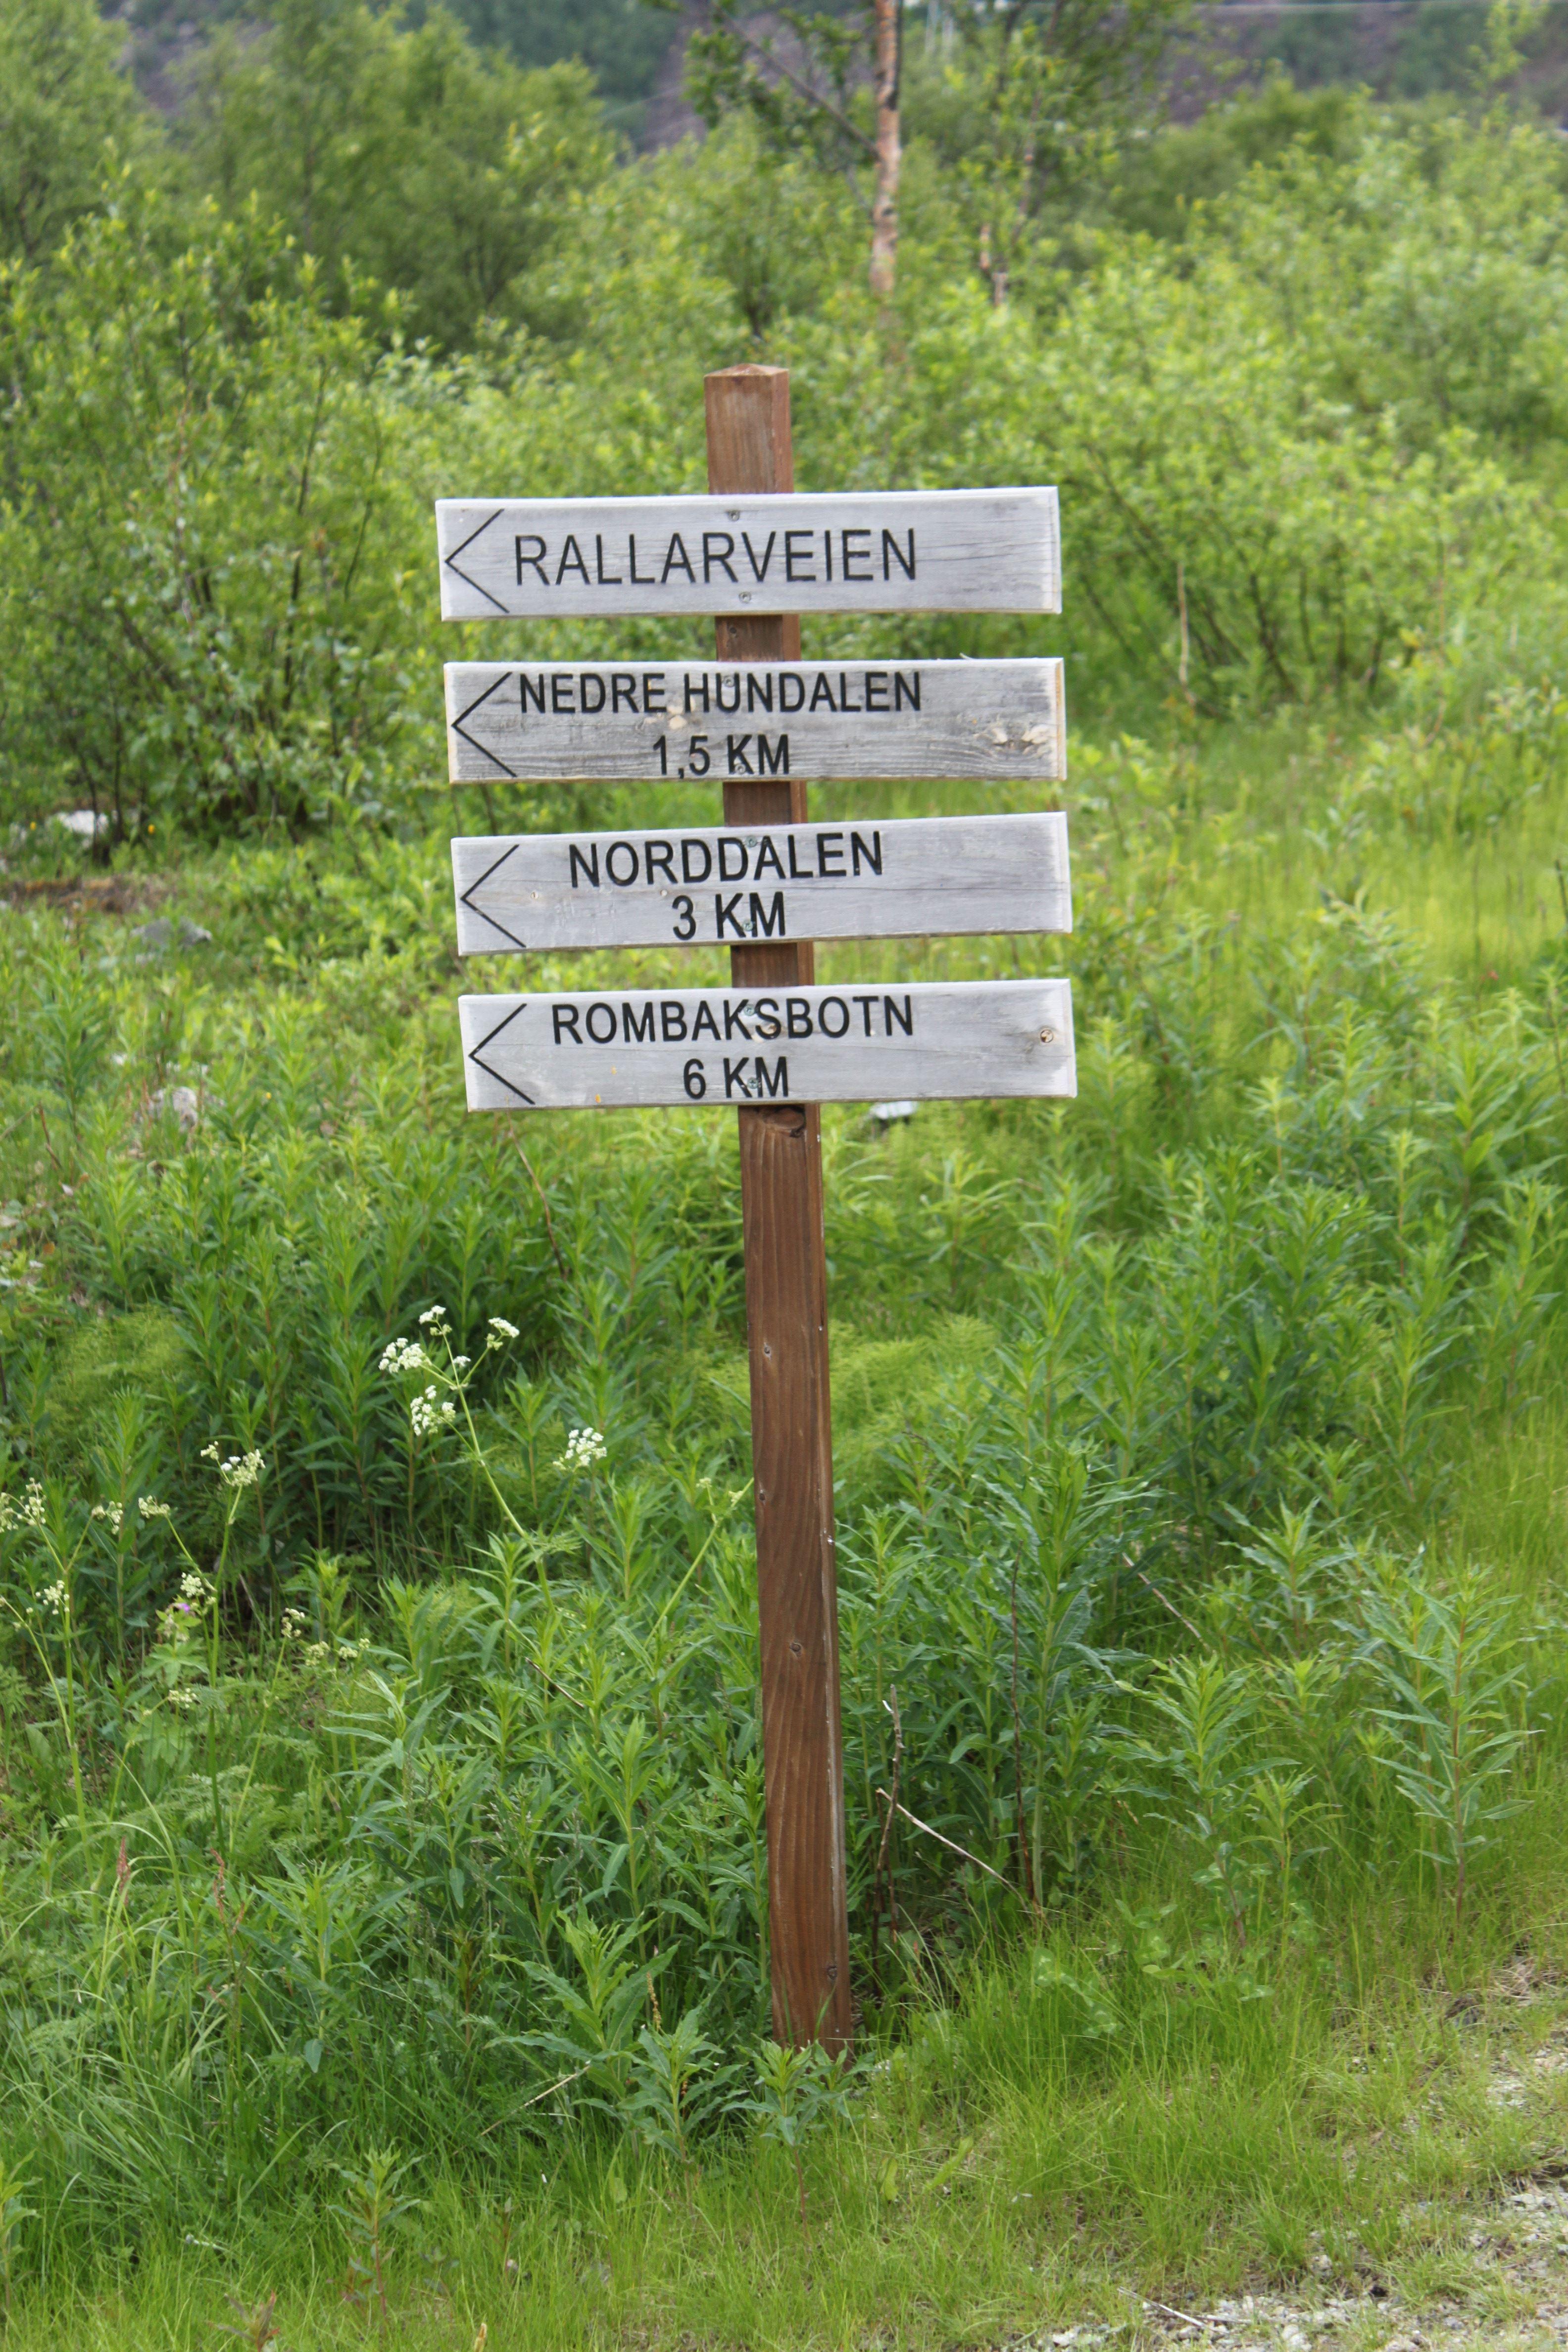 © Visit Narvik, Rallarveien sign